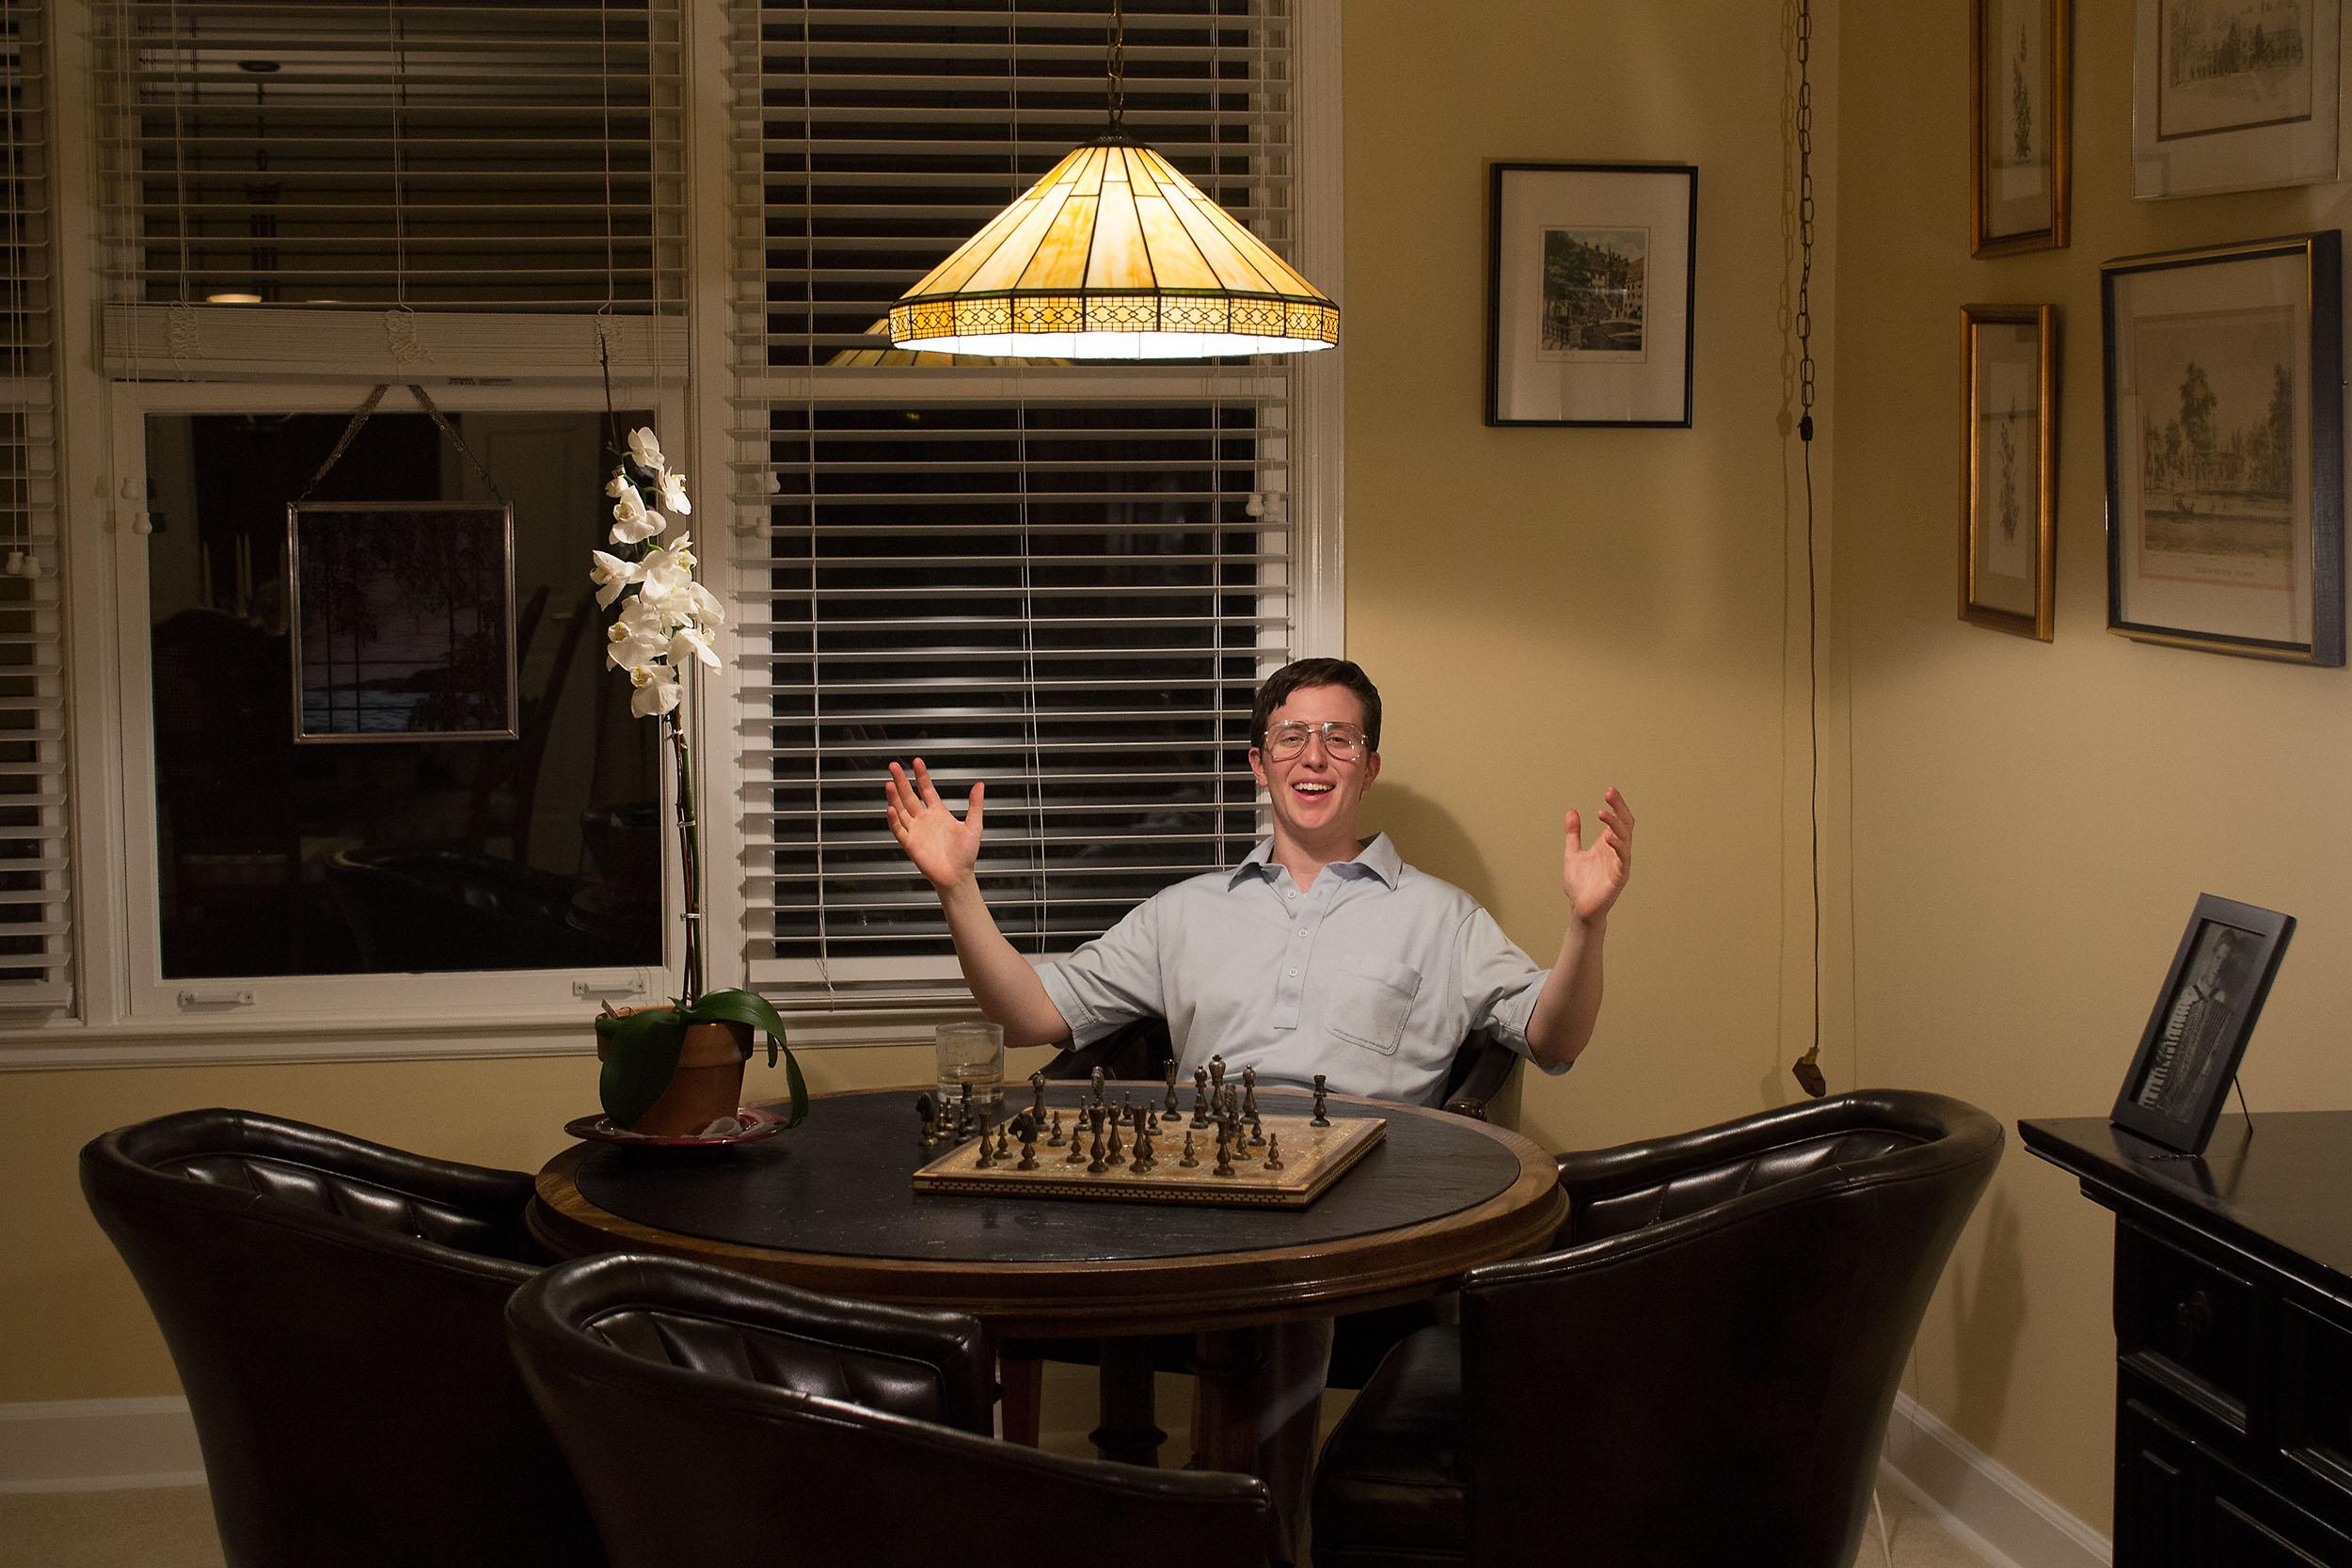 Passing of a Patriarch I: Kerfuffled at Chess